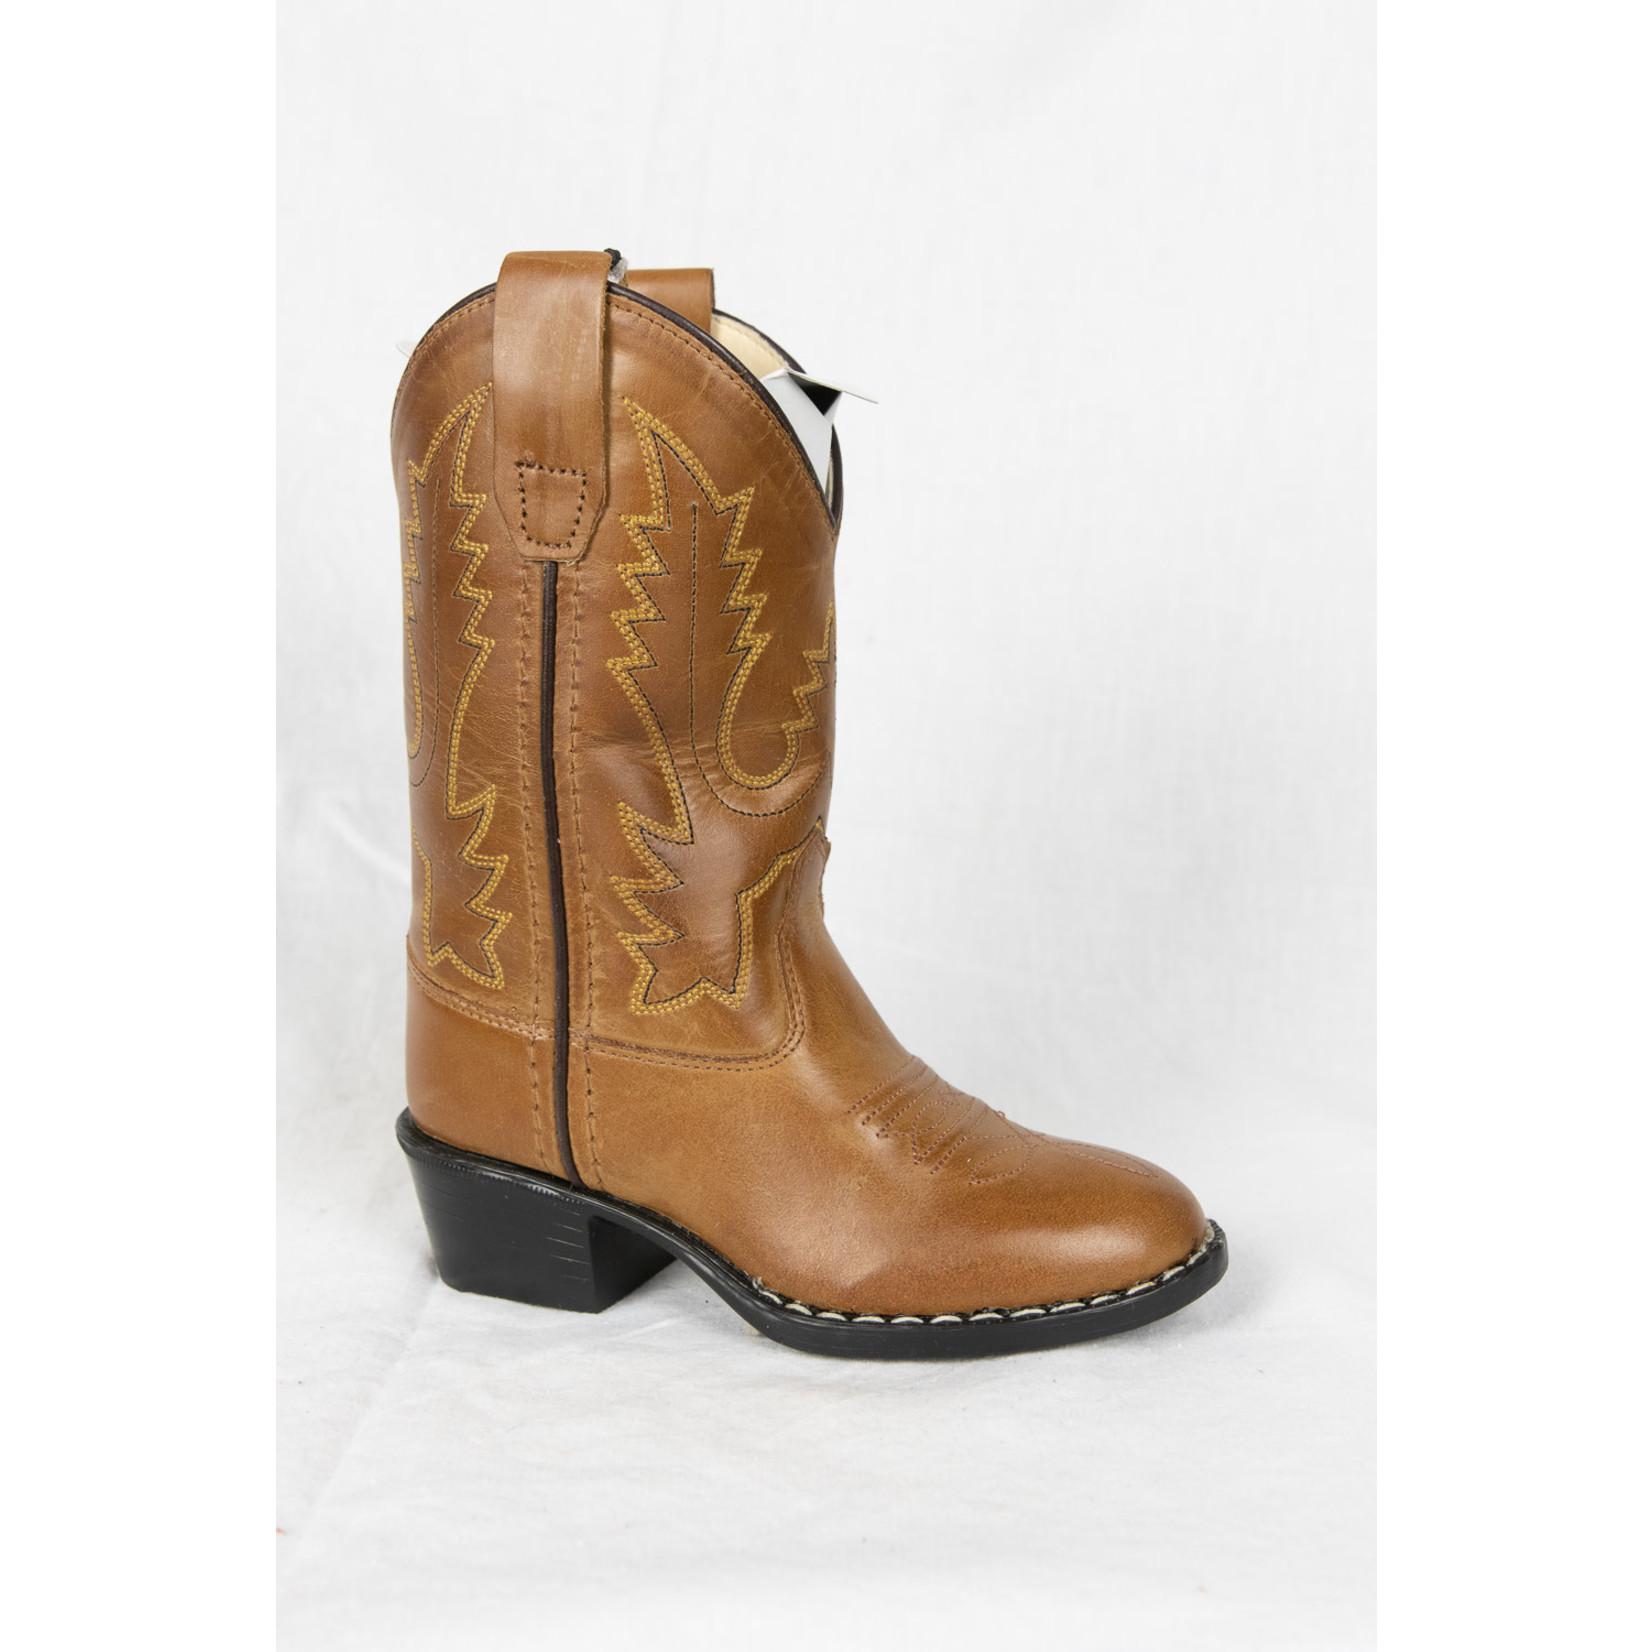 Old west Old West Children Brown Cowboy Boot 1129